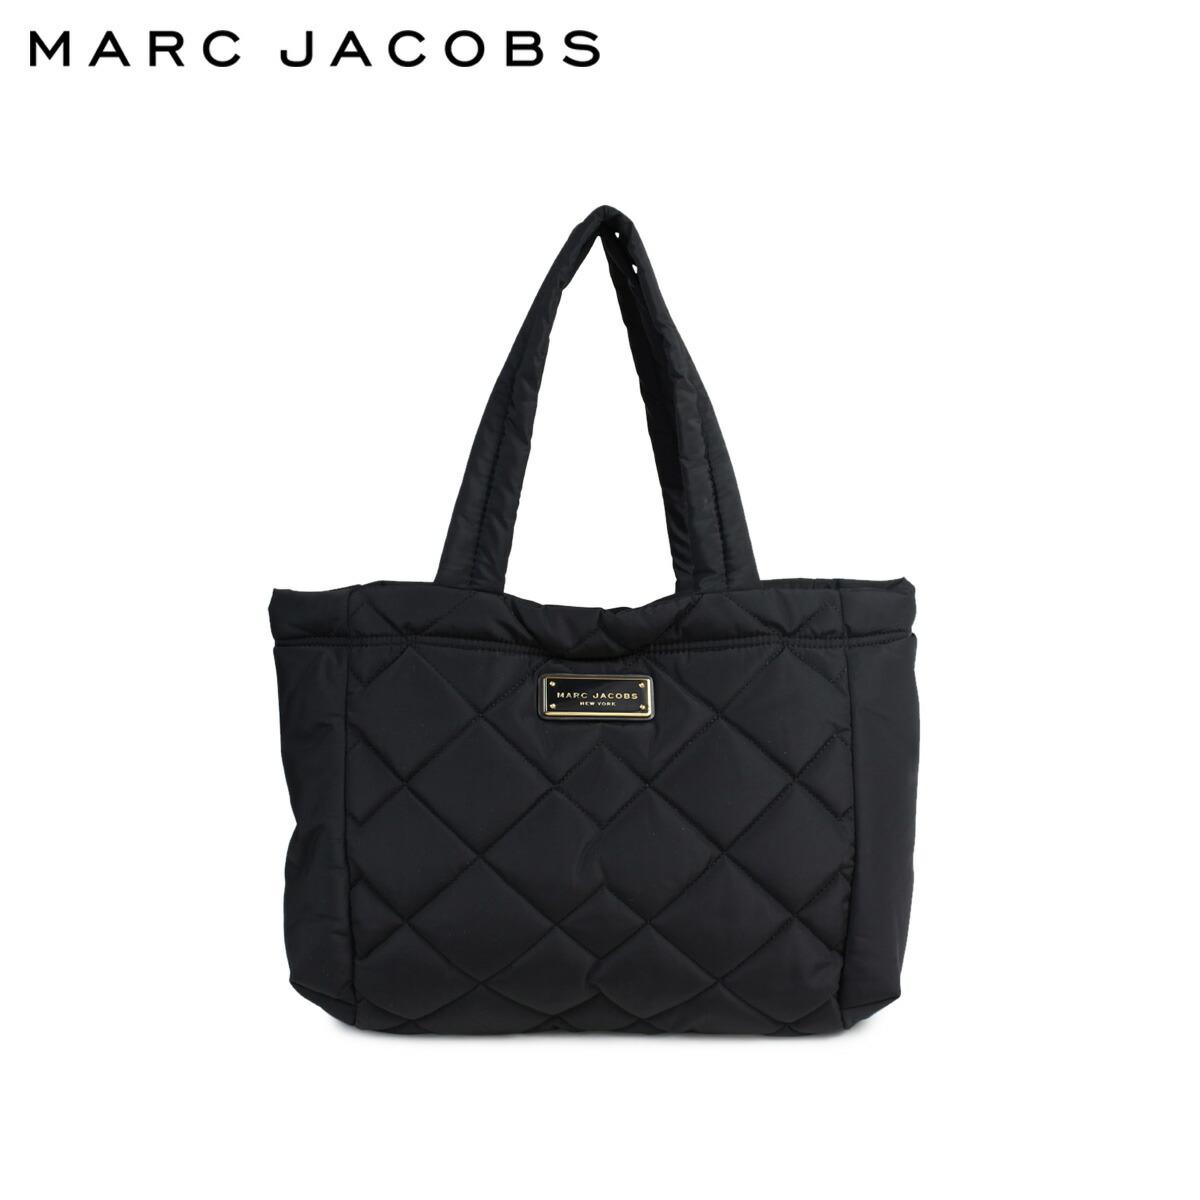 Black Marc Jacobs Bag - Best Photos Skirt and Bag Gitesdardennes.Org 7e289a700256d